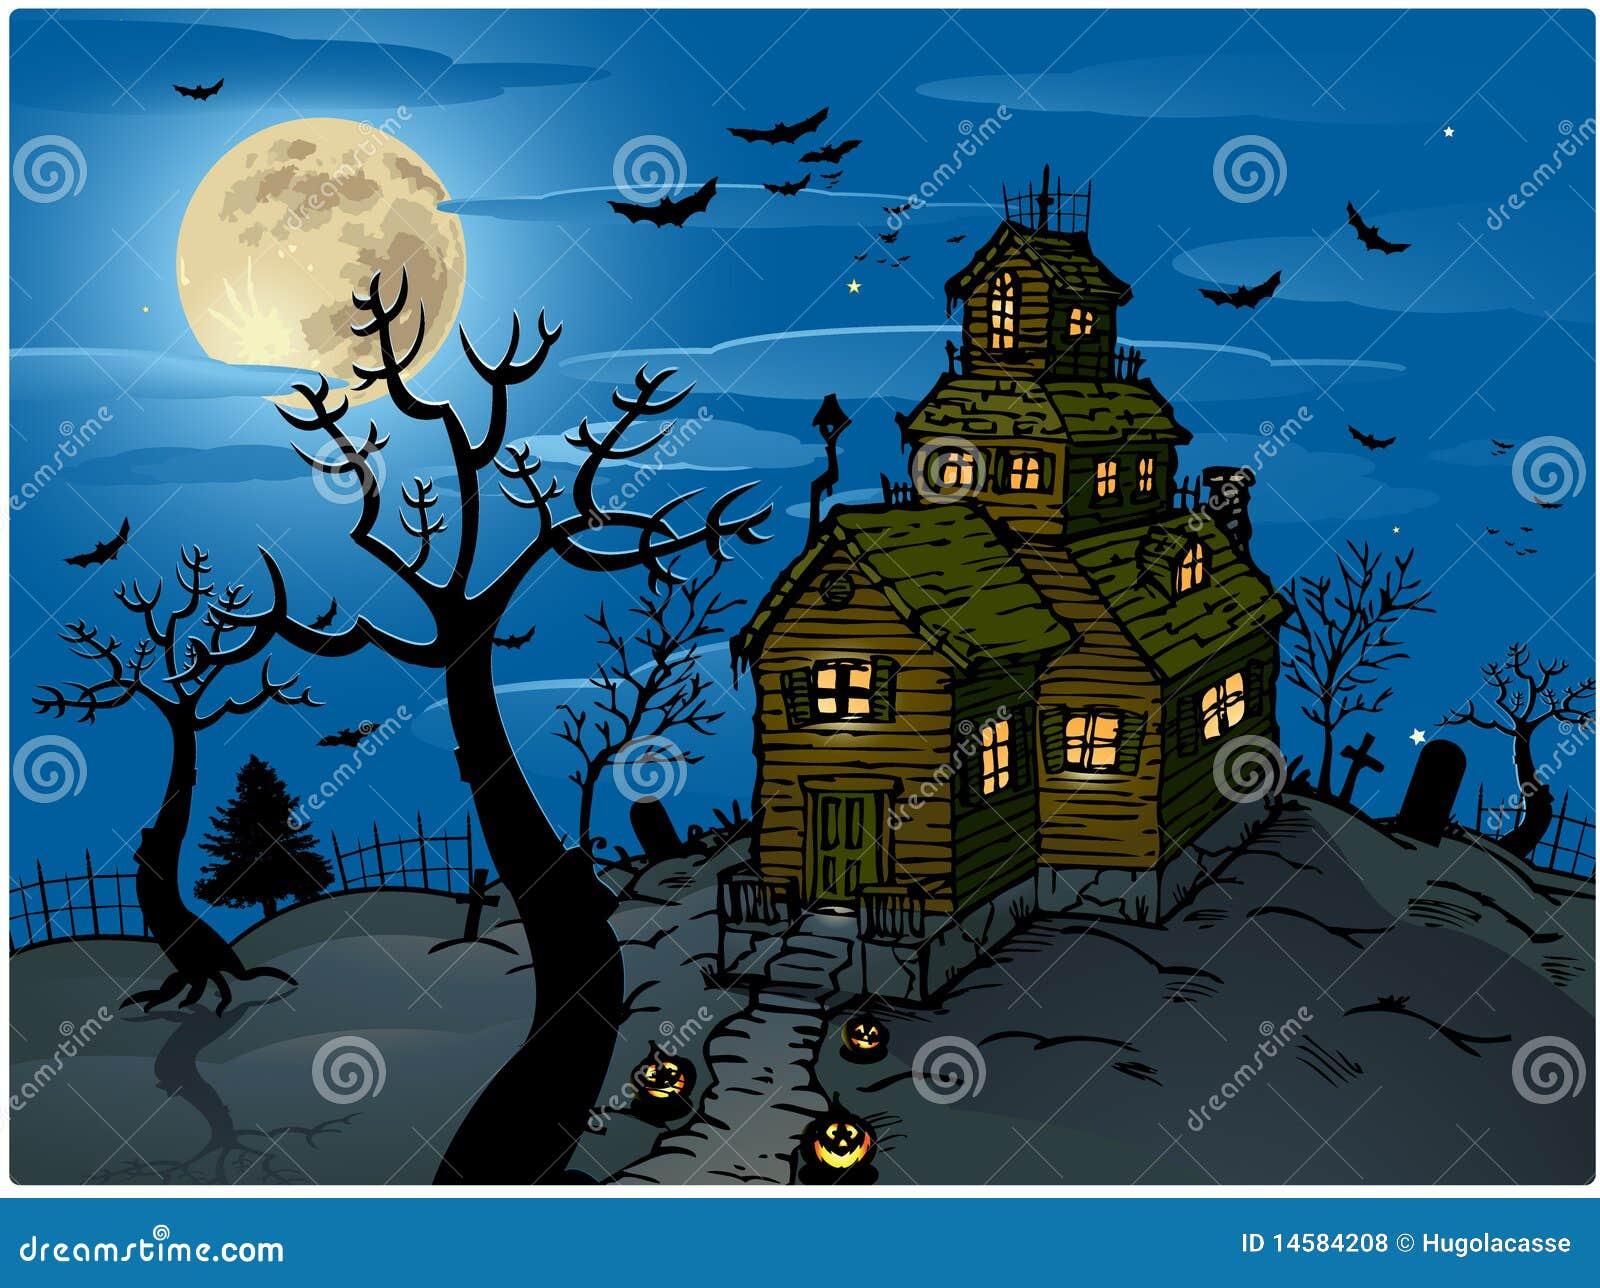 Haunted House Halloween Background Stock Illustration ...